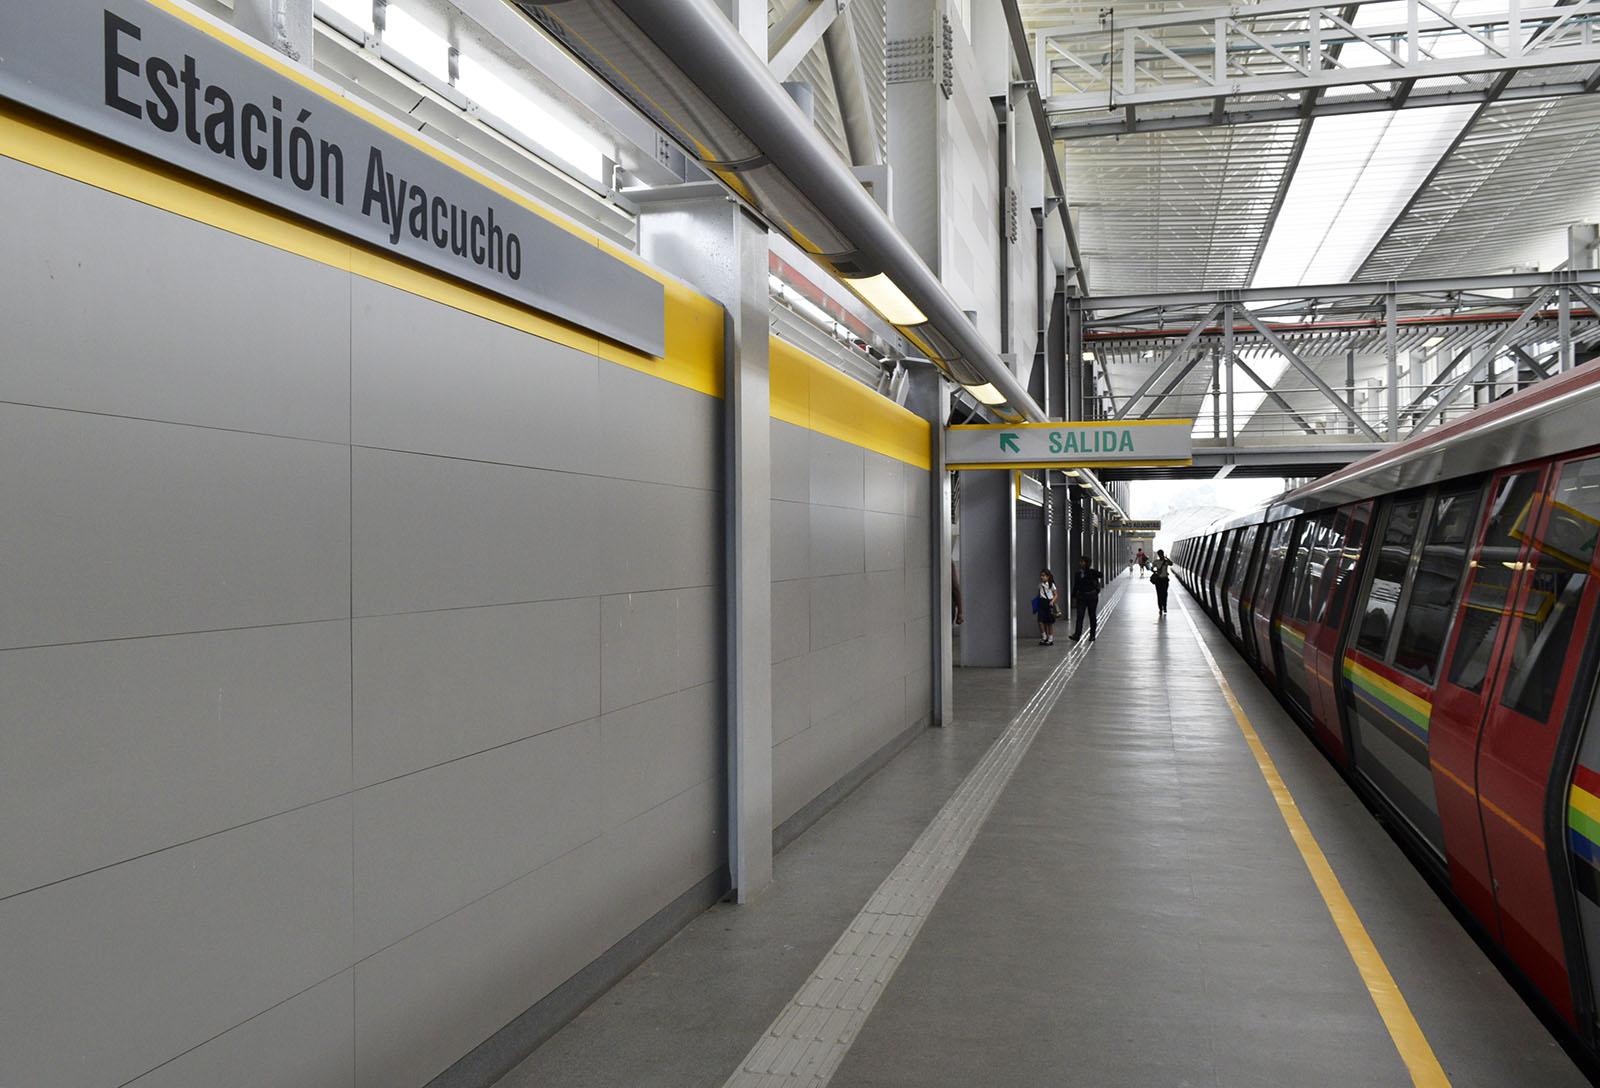 Estación Ayacucho